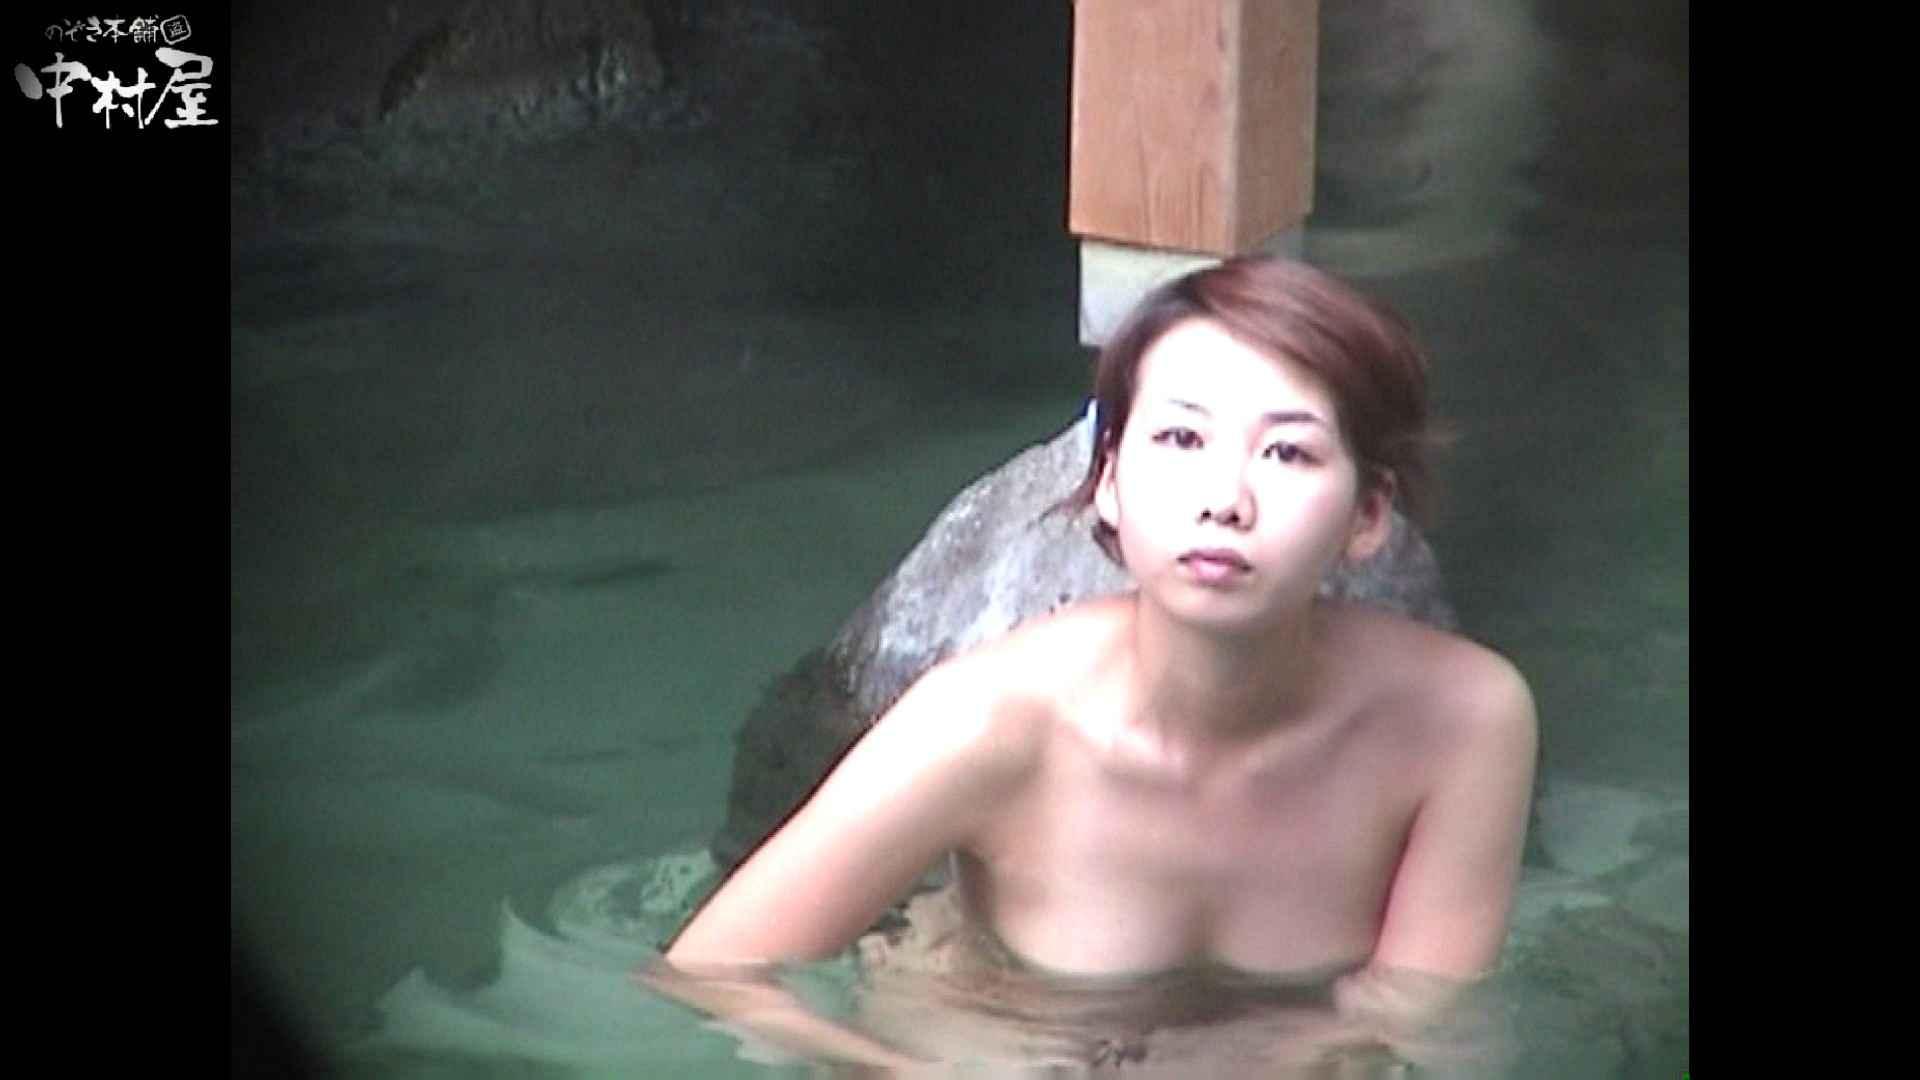 Aquaな露天風呂Vol.951 盗撮師作品  96pic 84